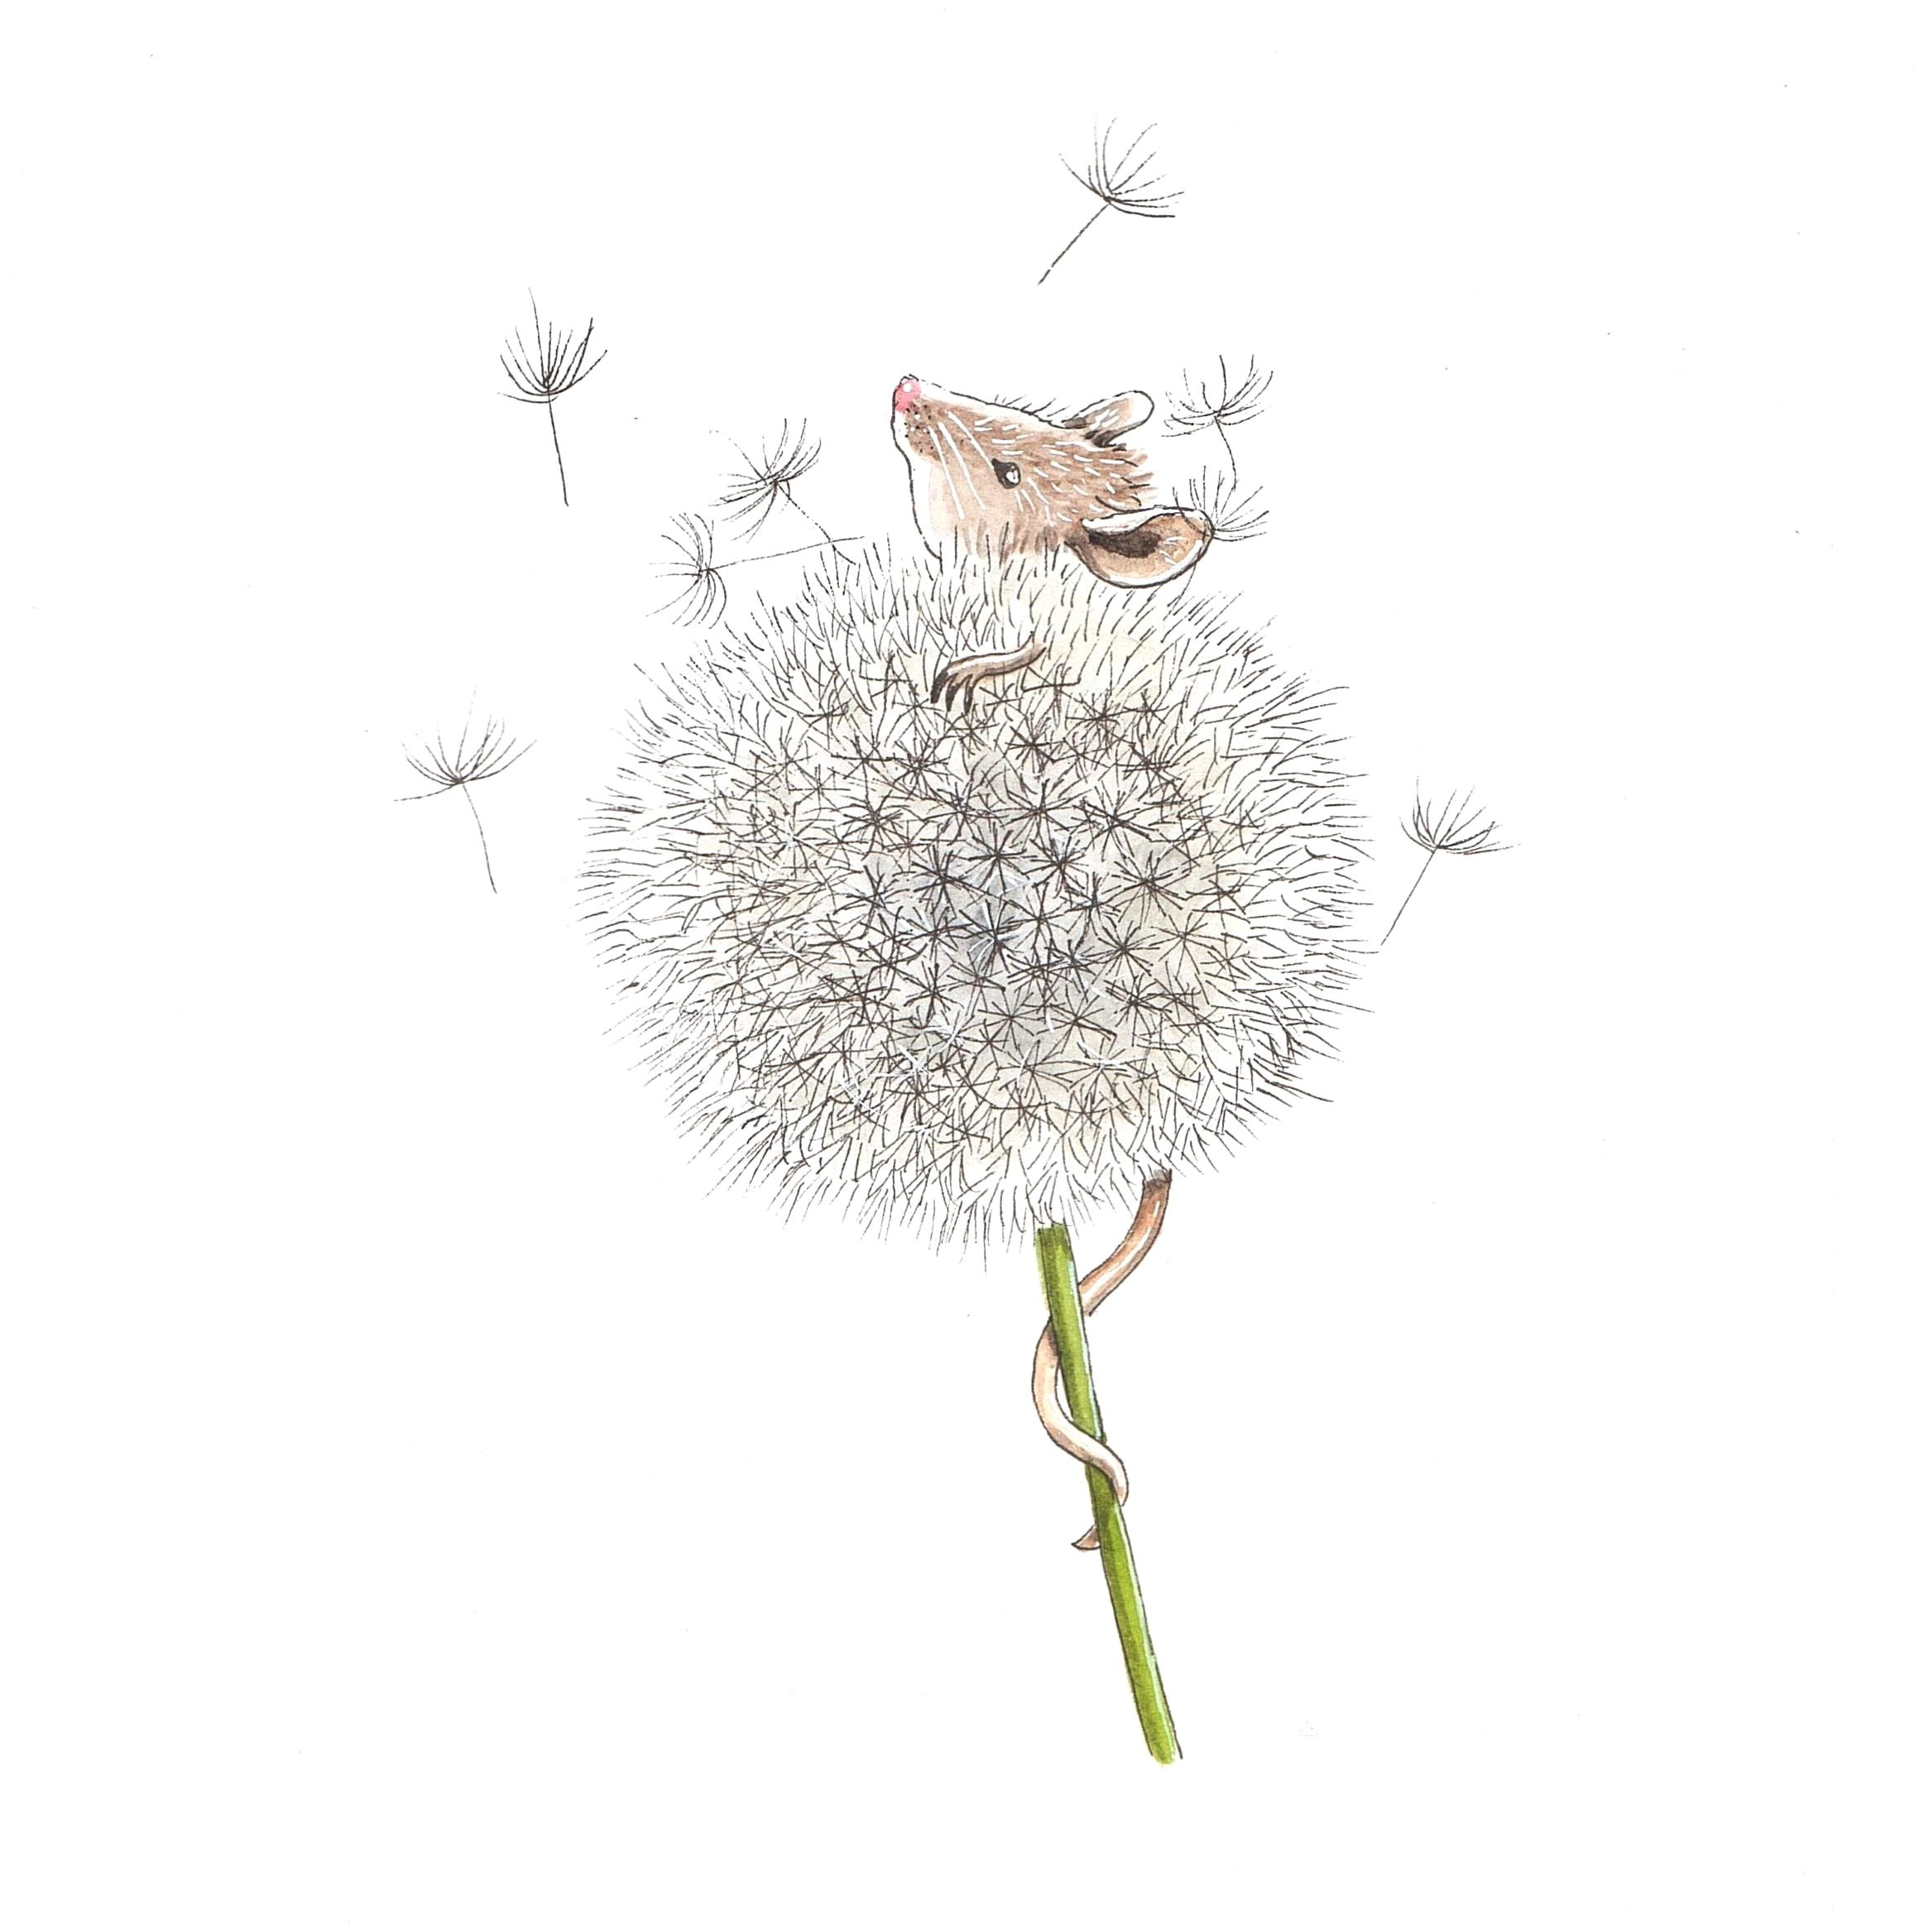 Mouse Dandelion Illustration